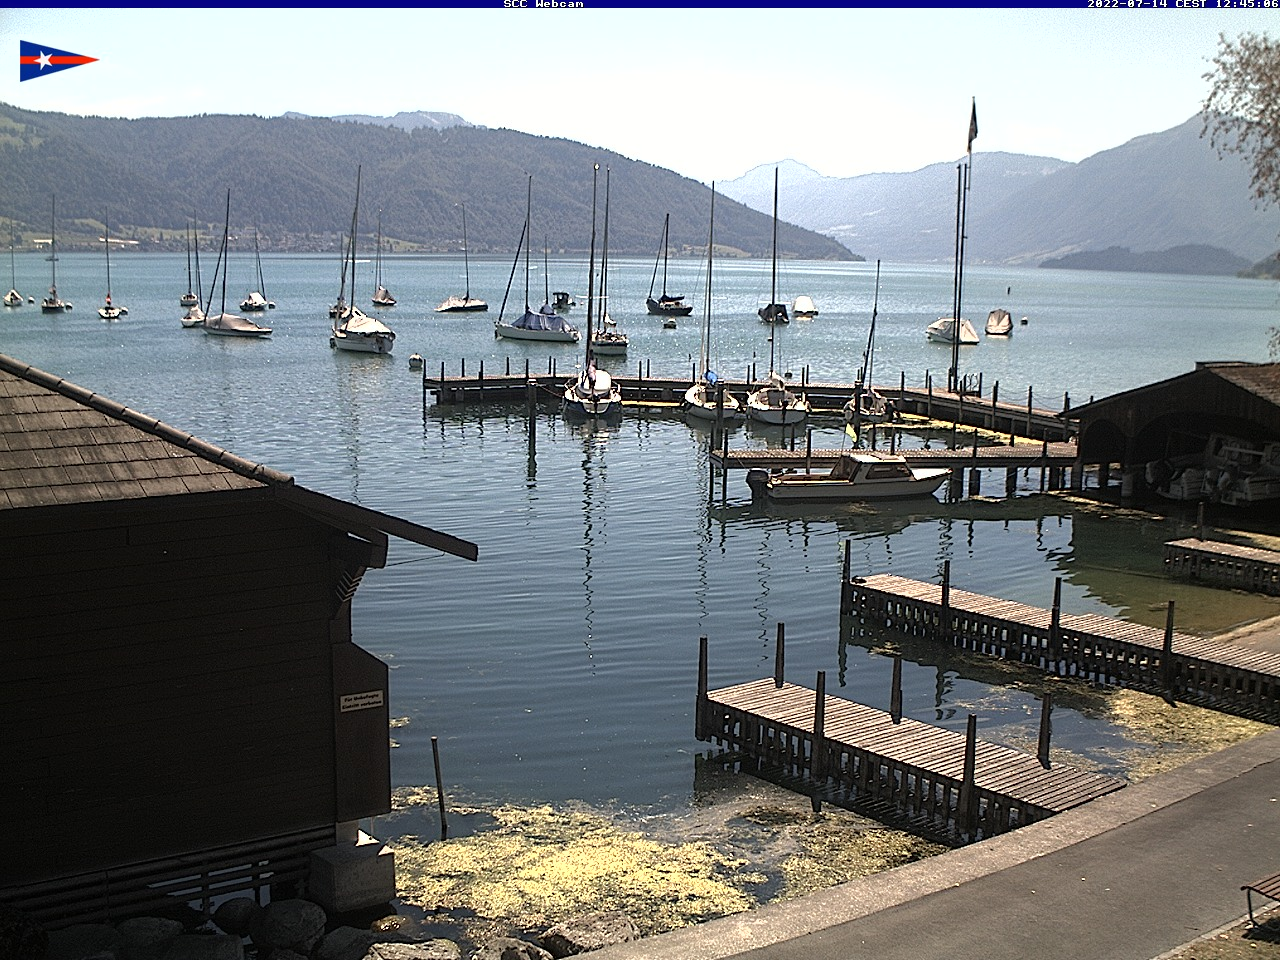 Webcam-Livebild Aktualisierung jede Min